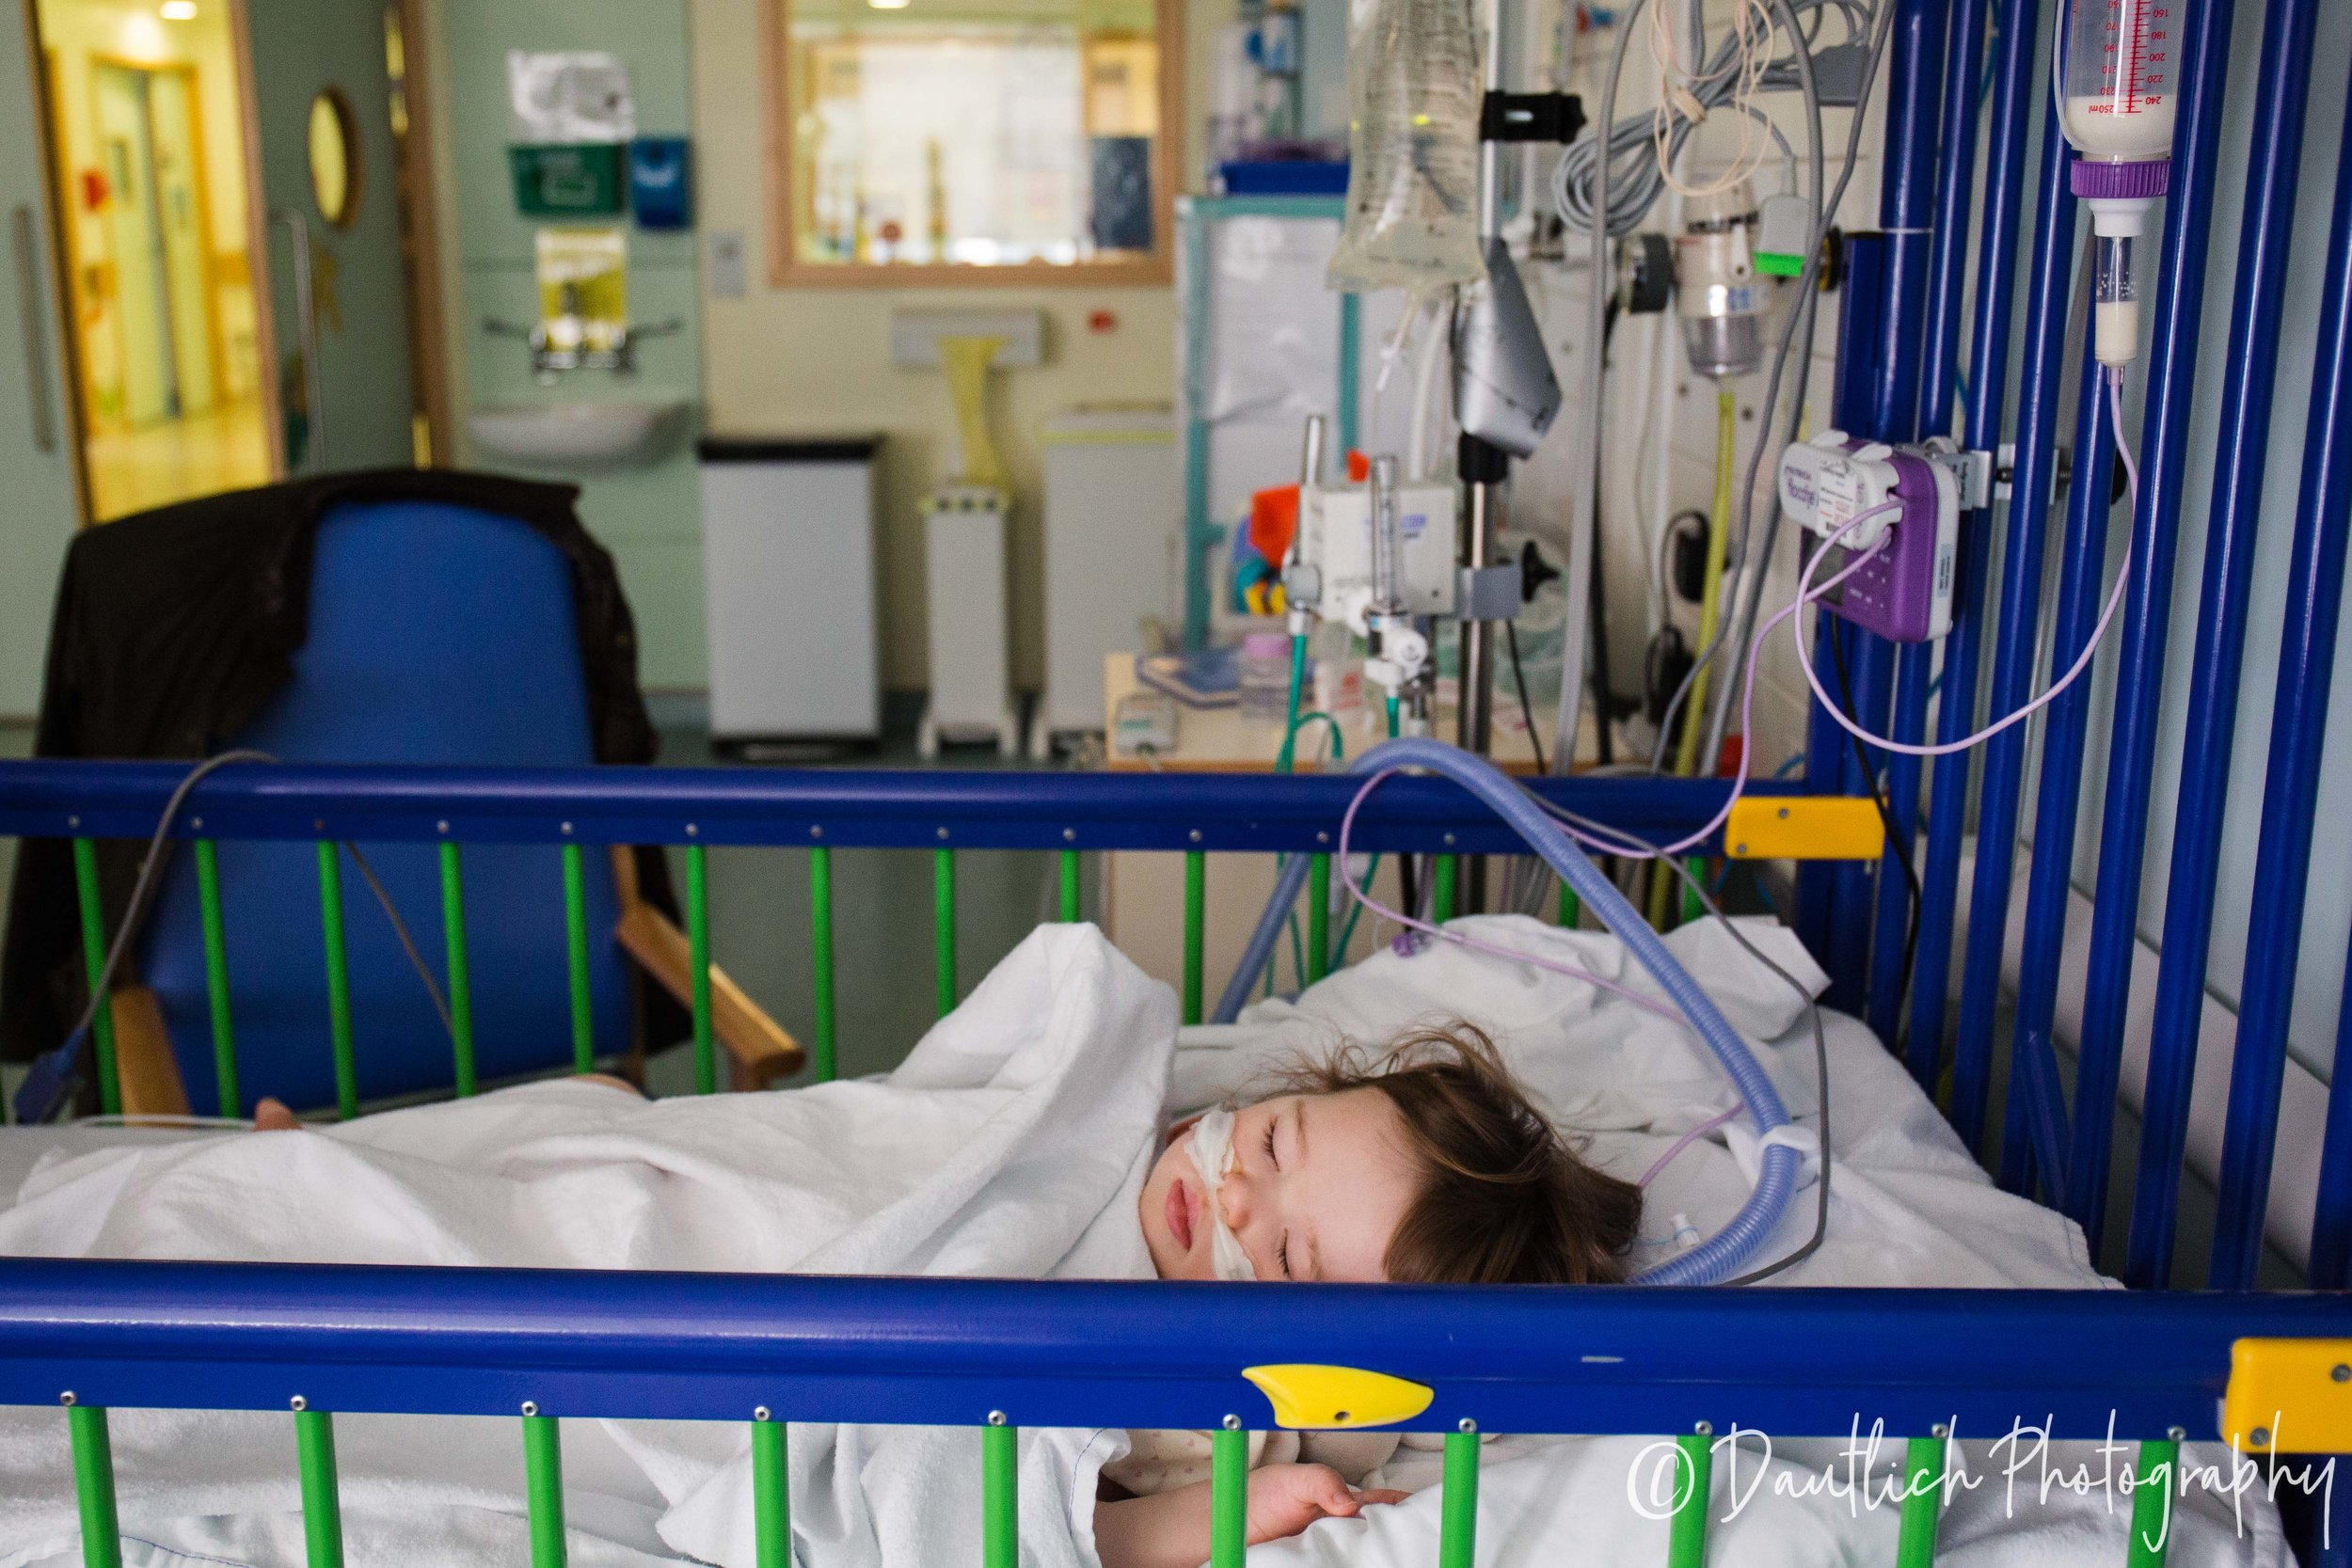 Holding Ben in hospital bed